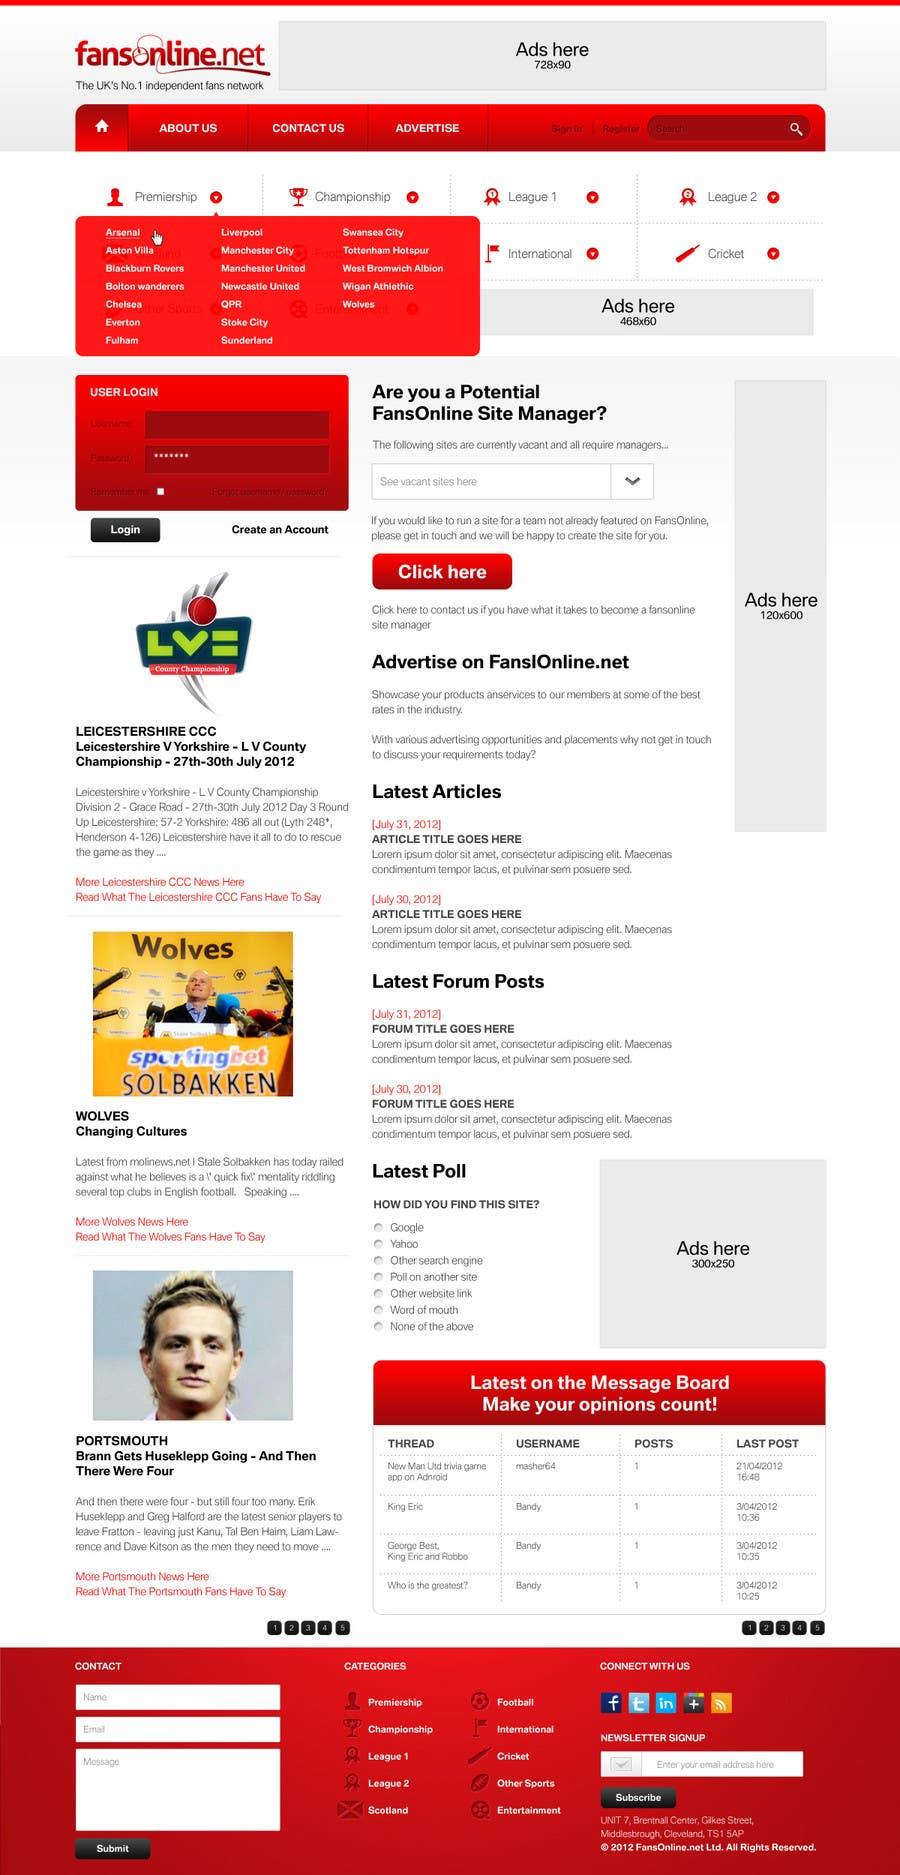 Bài tham dự cuộc thi #                                        7                                      cho                                         Website Design for FansOnline.net Ltd